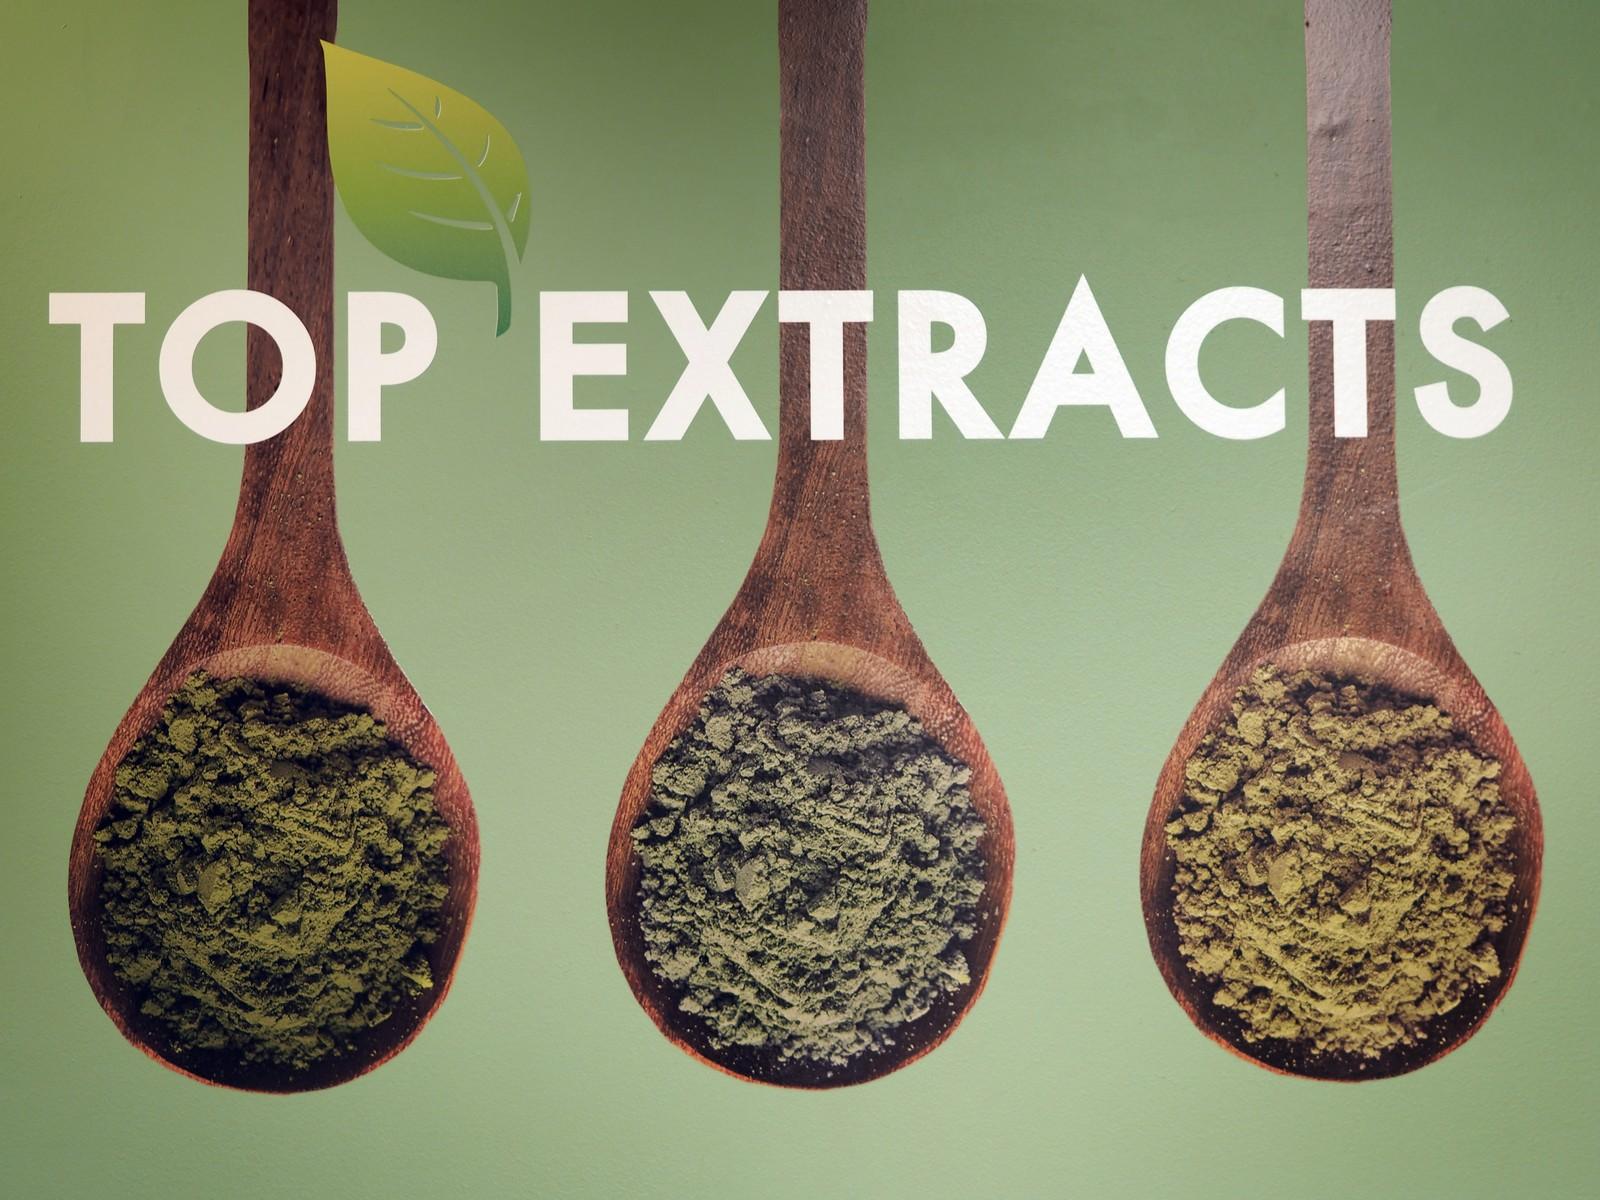 Top Extracts Weekly Kratom Giveaway  Excludes Alabama, Arkansas, Indiana, Rhode Island, Vermont, Wisconsin Giveaway Image